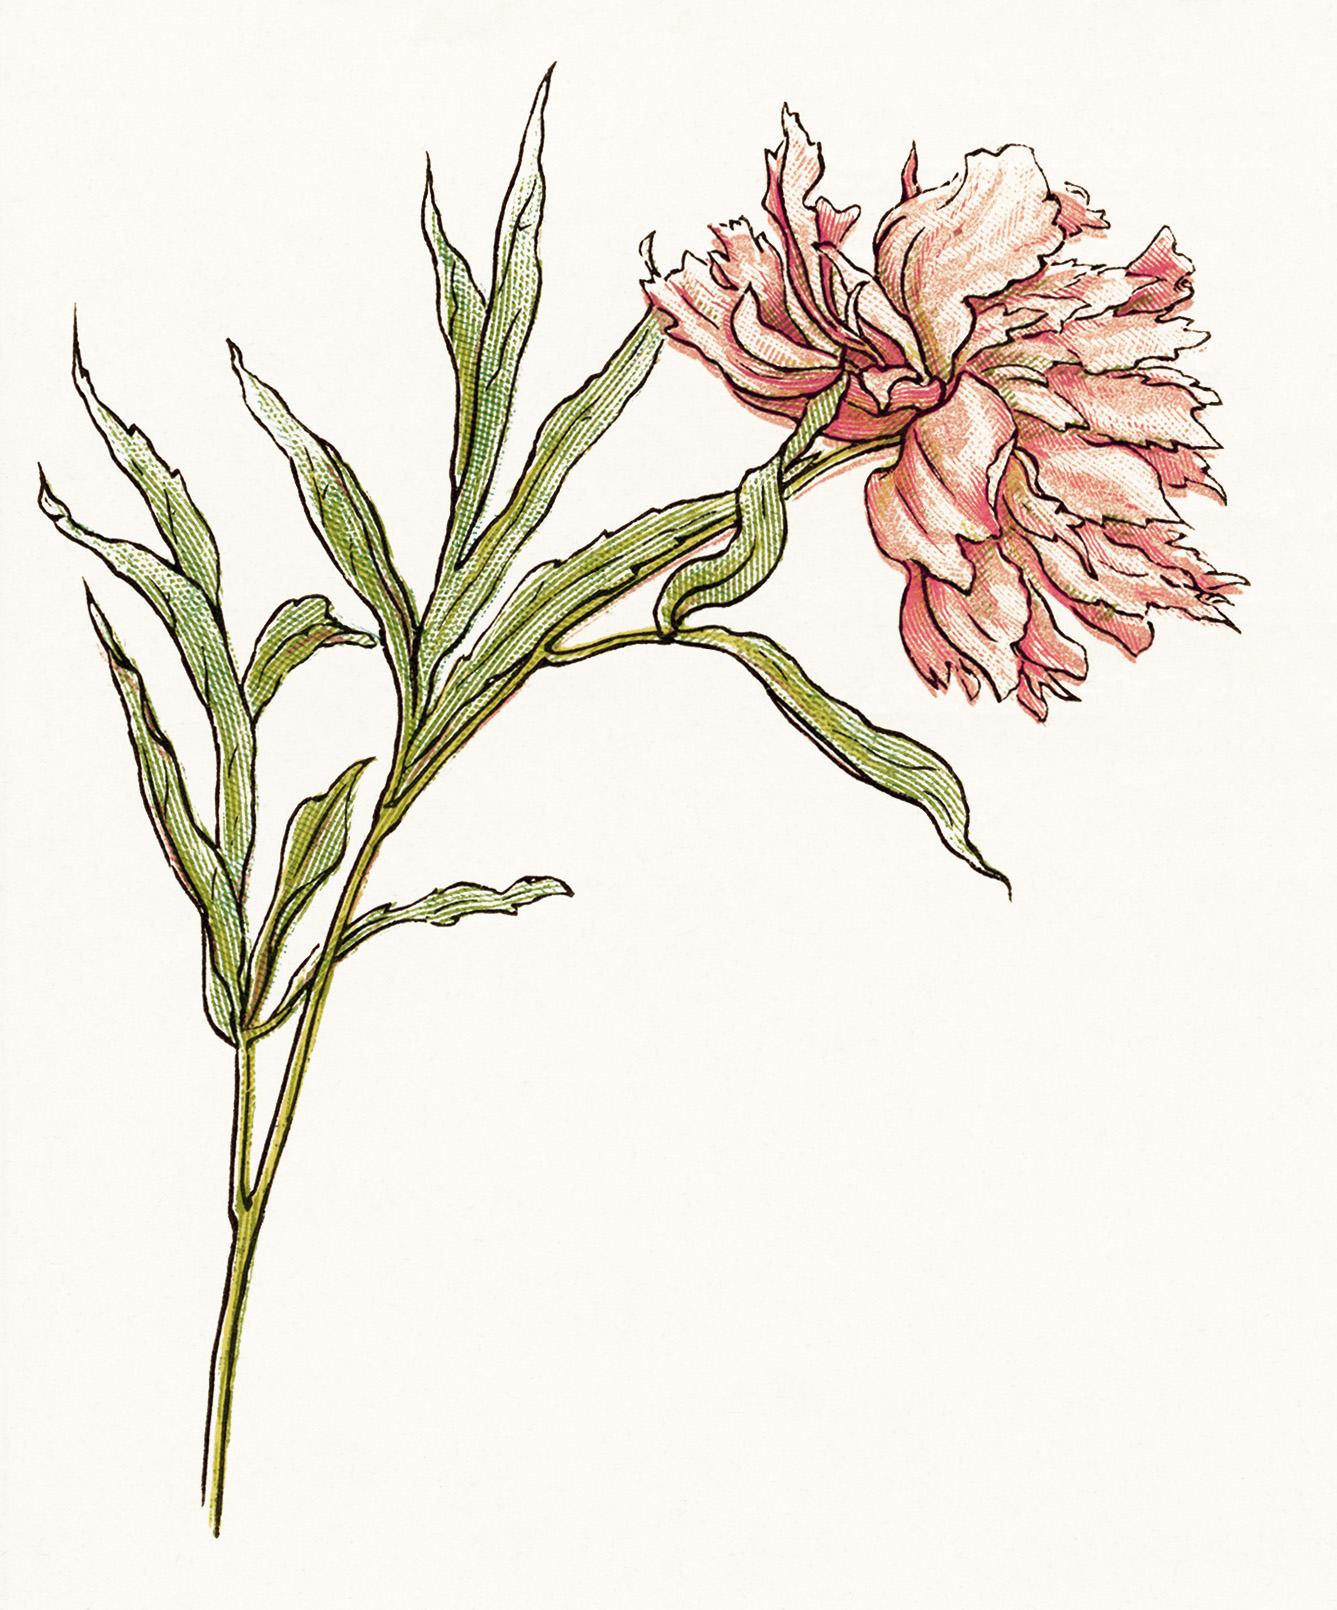 kate greenaway flower, pink peony clipart, free vintage floral image, storybook flower illustration, vintage garden printable